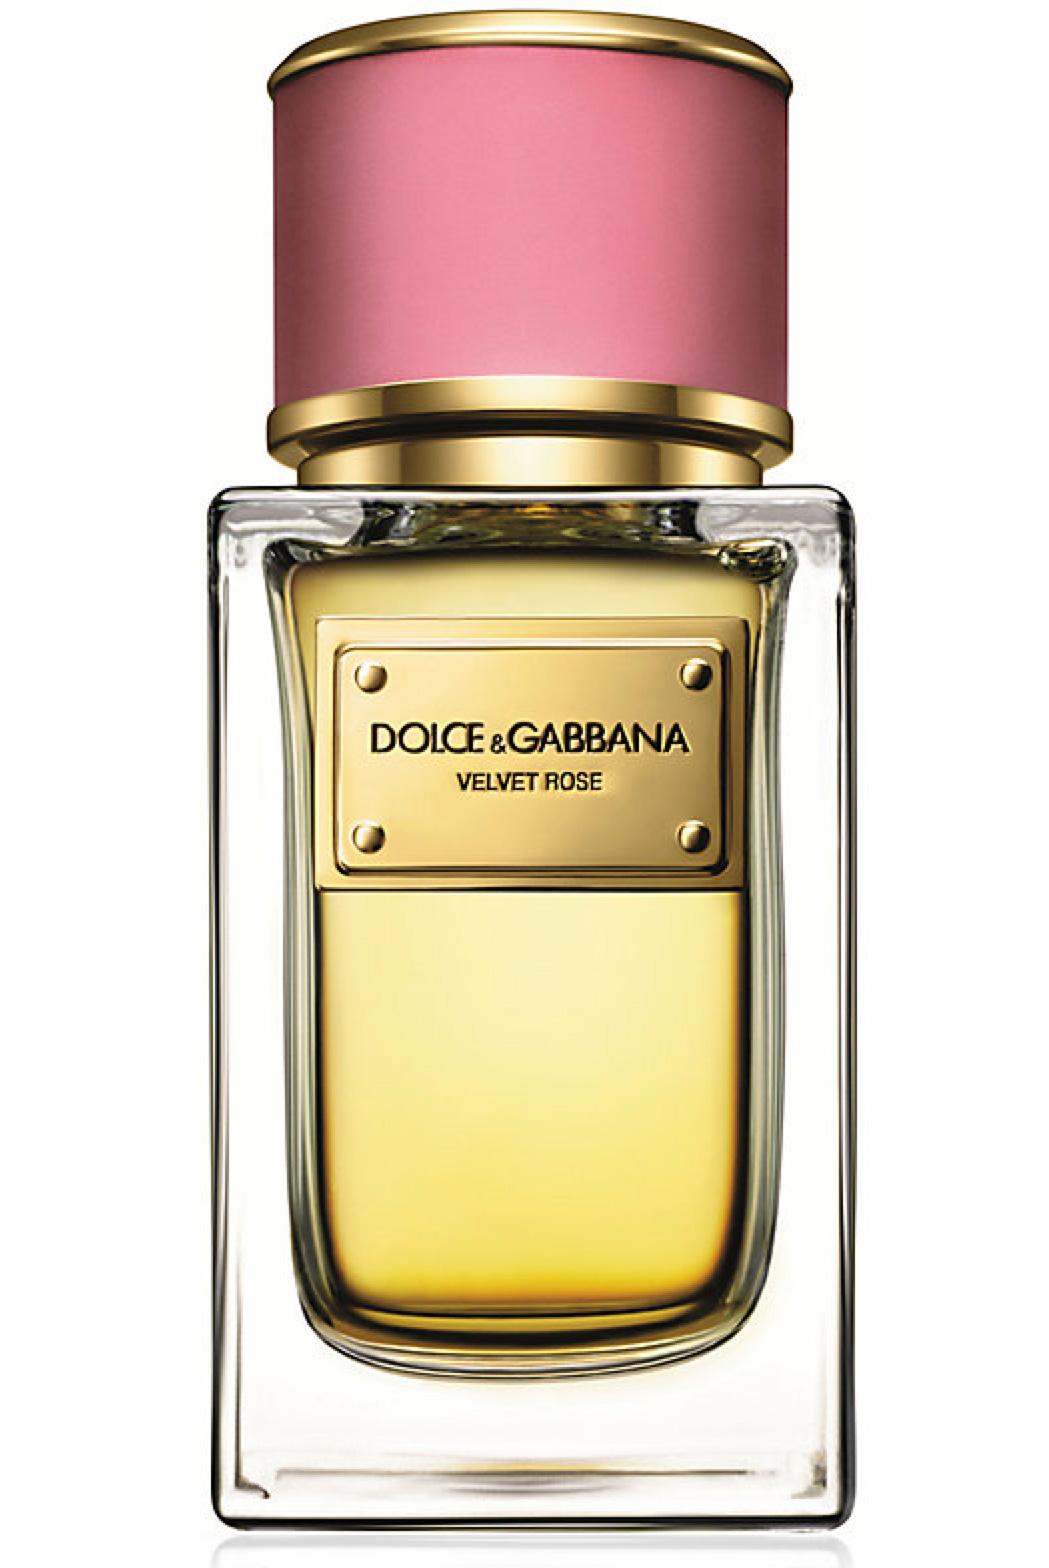 Dolce & Gabbana Velvet Rose parfémovaná voda 50 ml TESTER